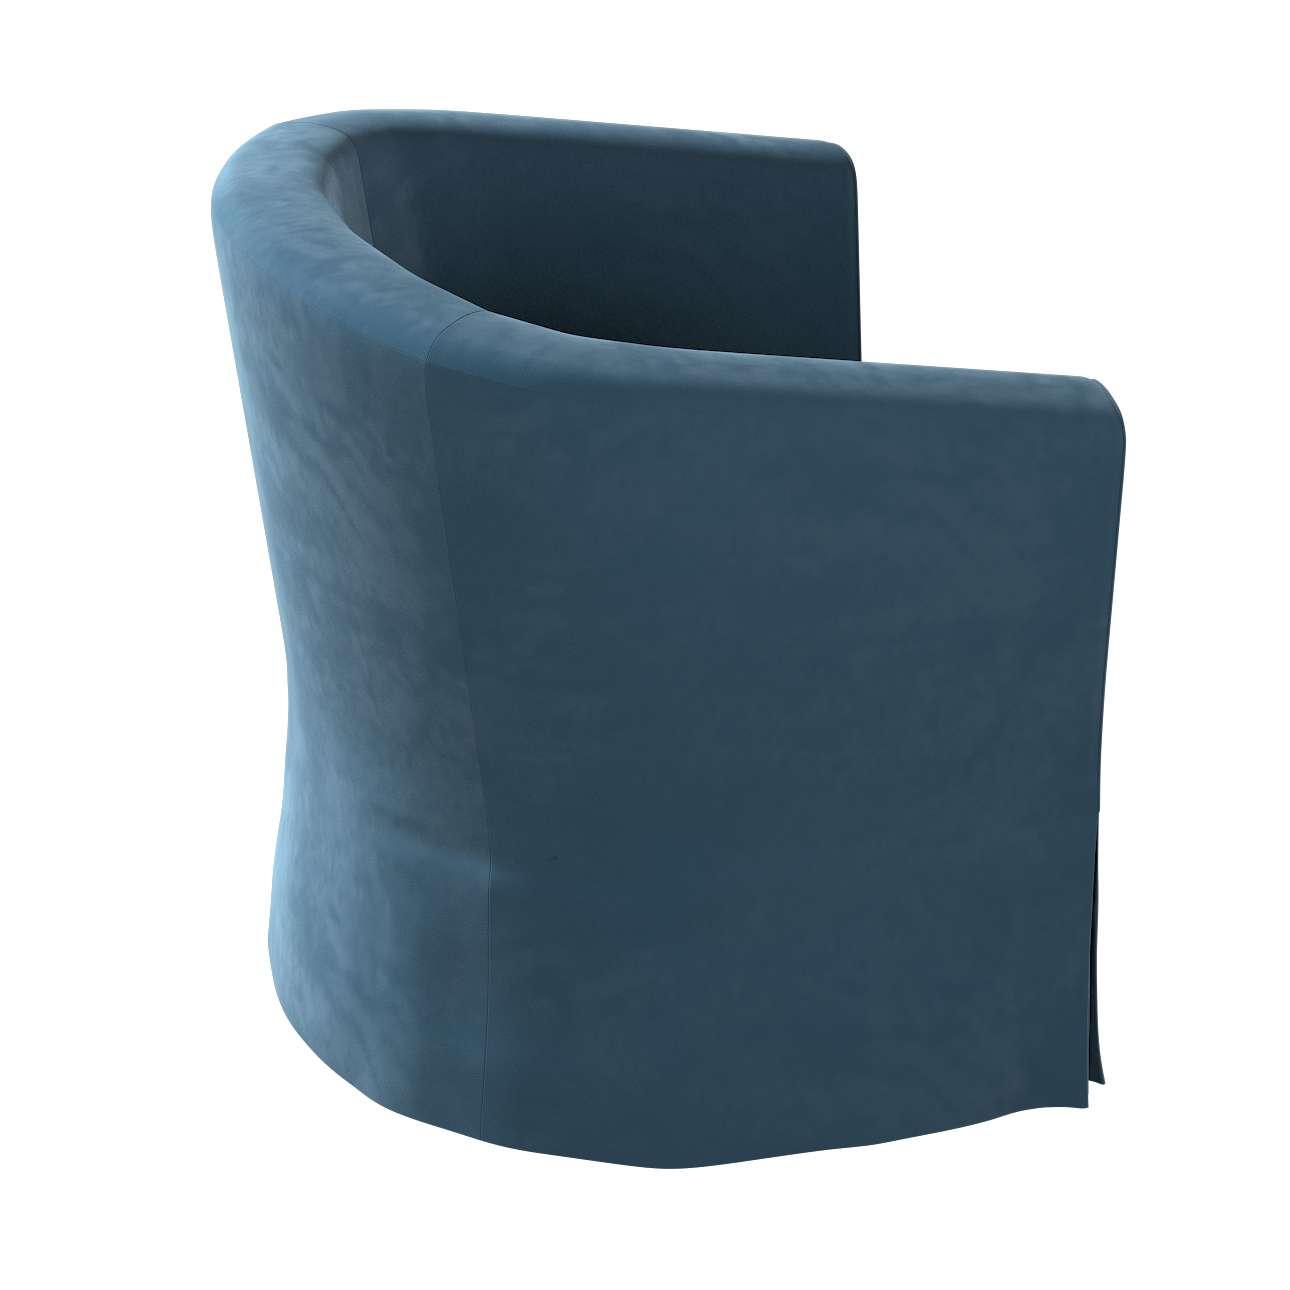 Pokrowiec na fotel Ektorp Tullsta w kolekcji Velvet, tkanina: 704-16